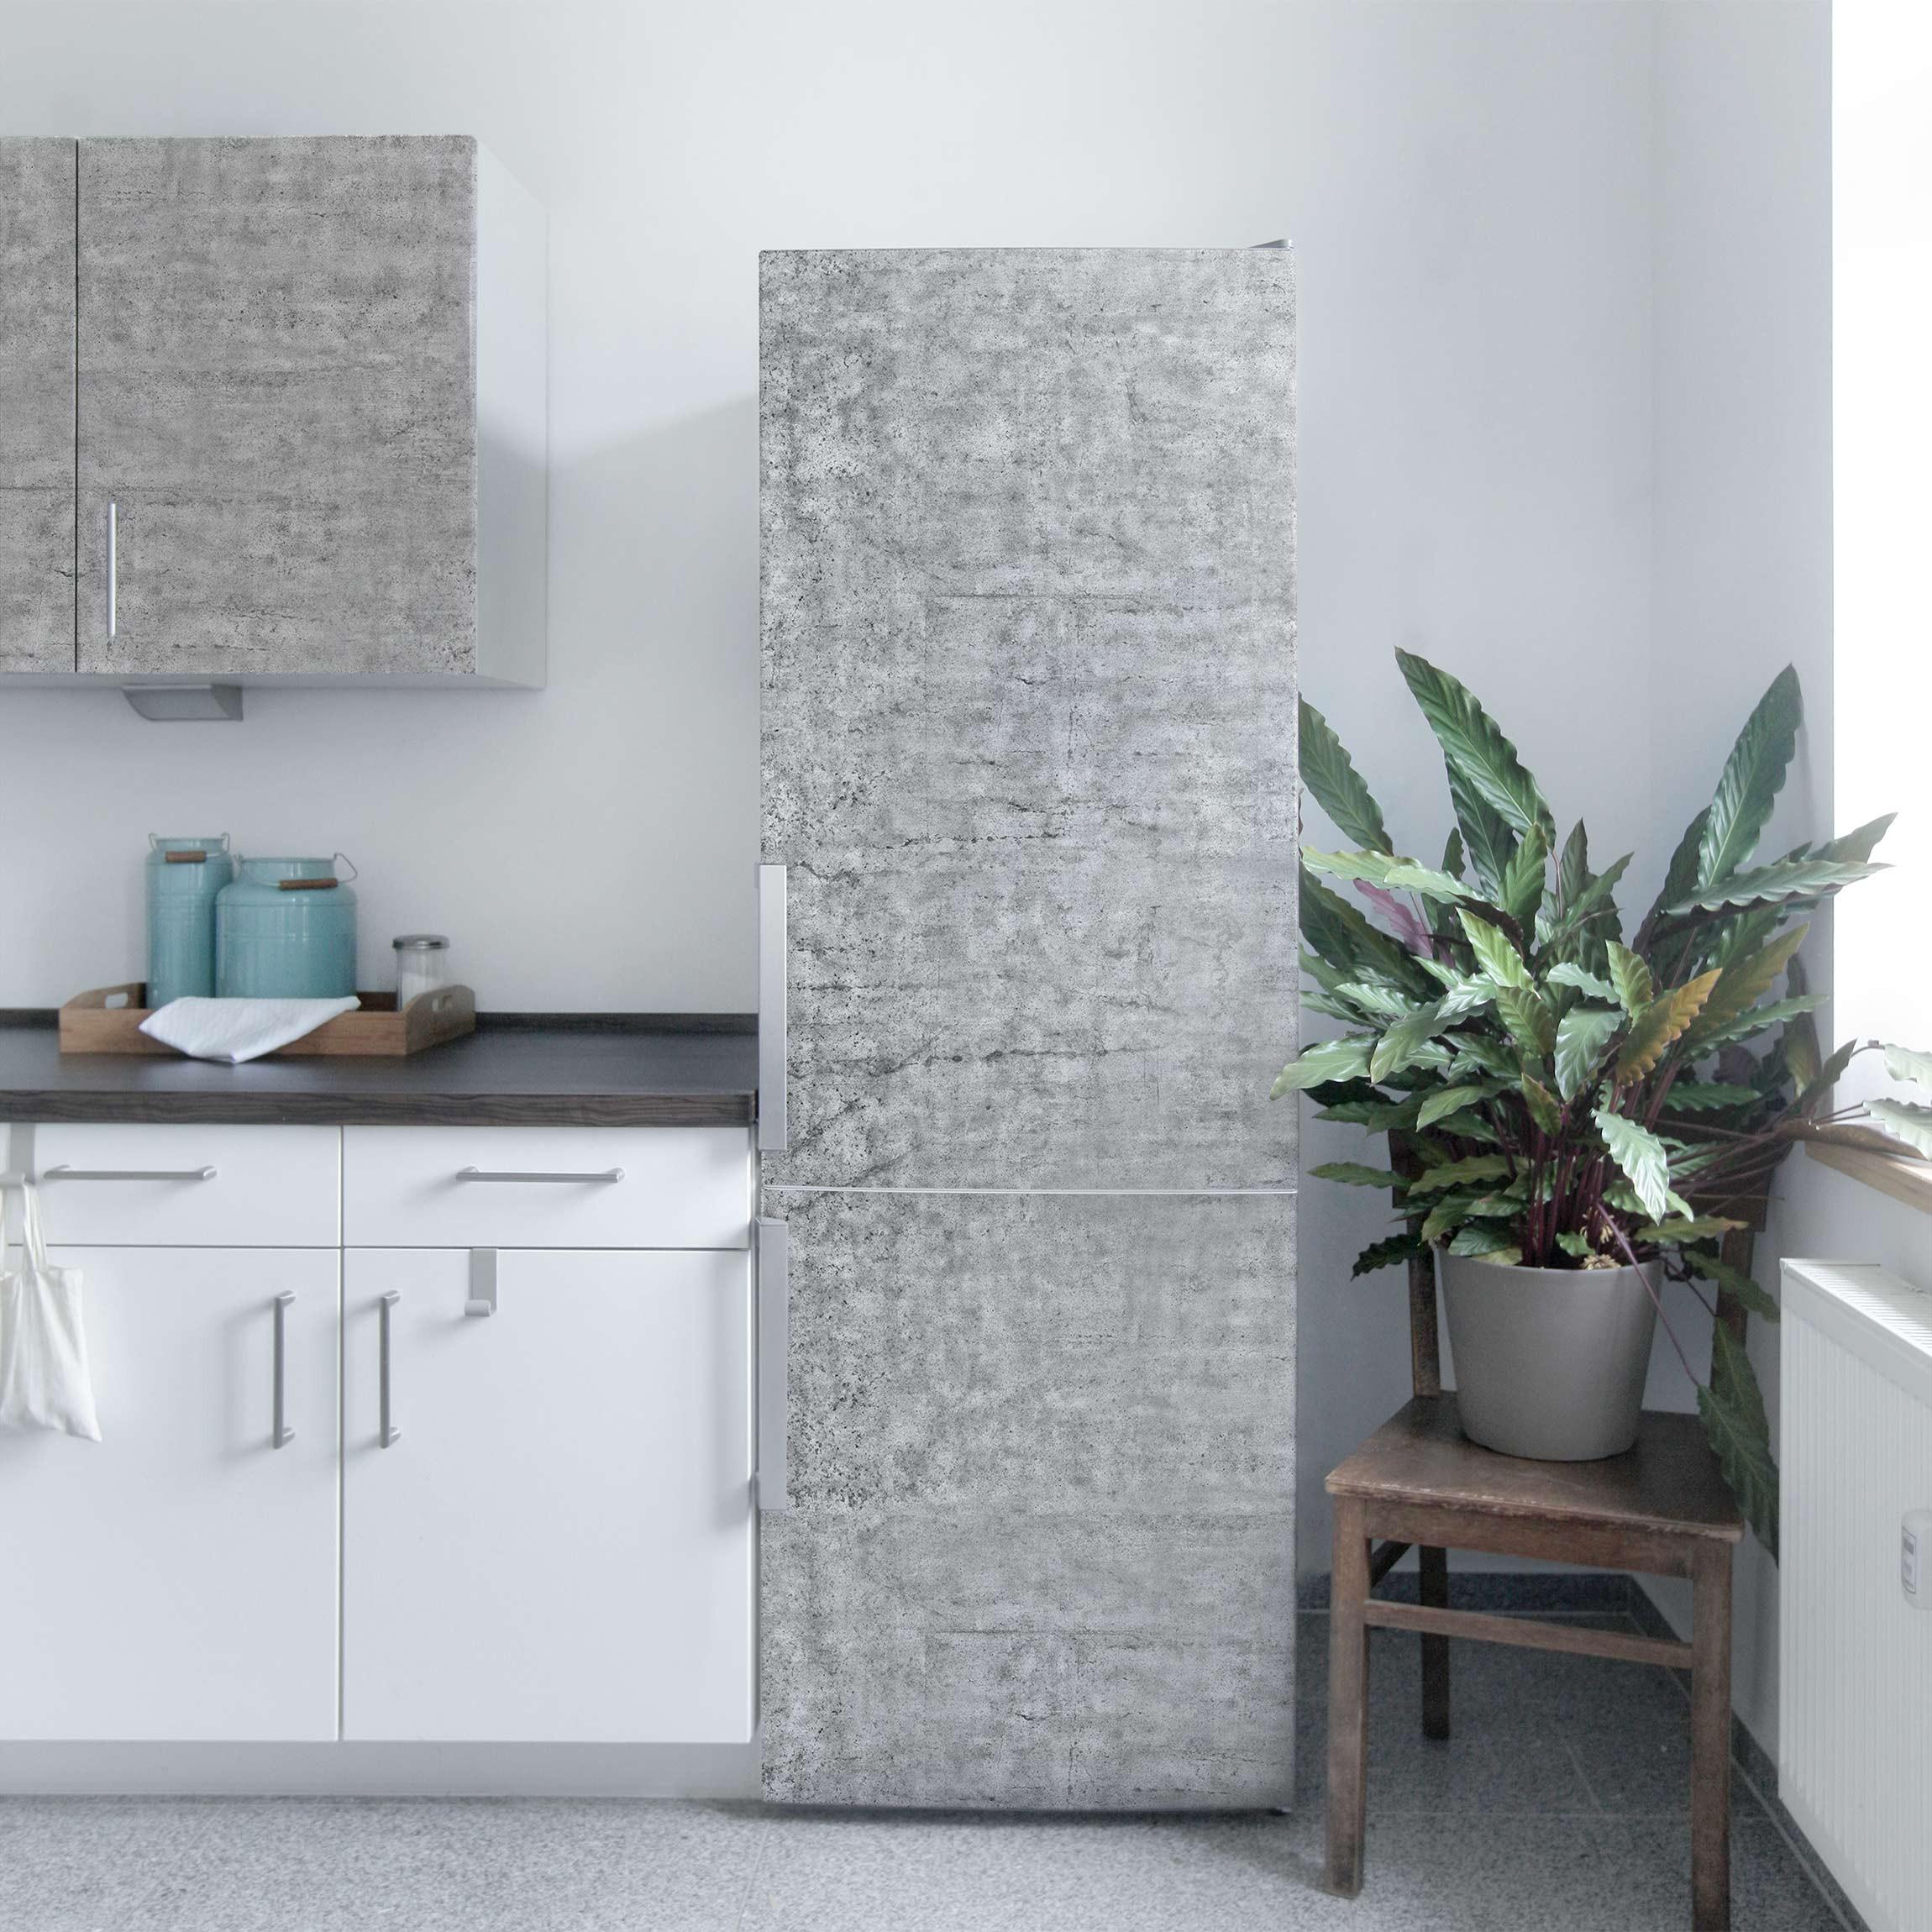 Möbelfolie - Beton Ciré - Klebefolie für Möbel